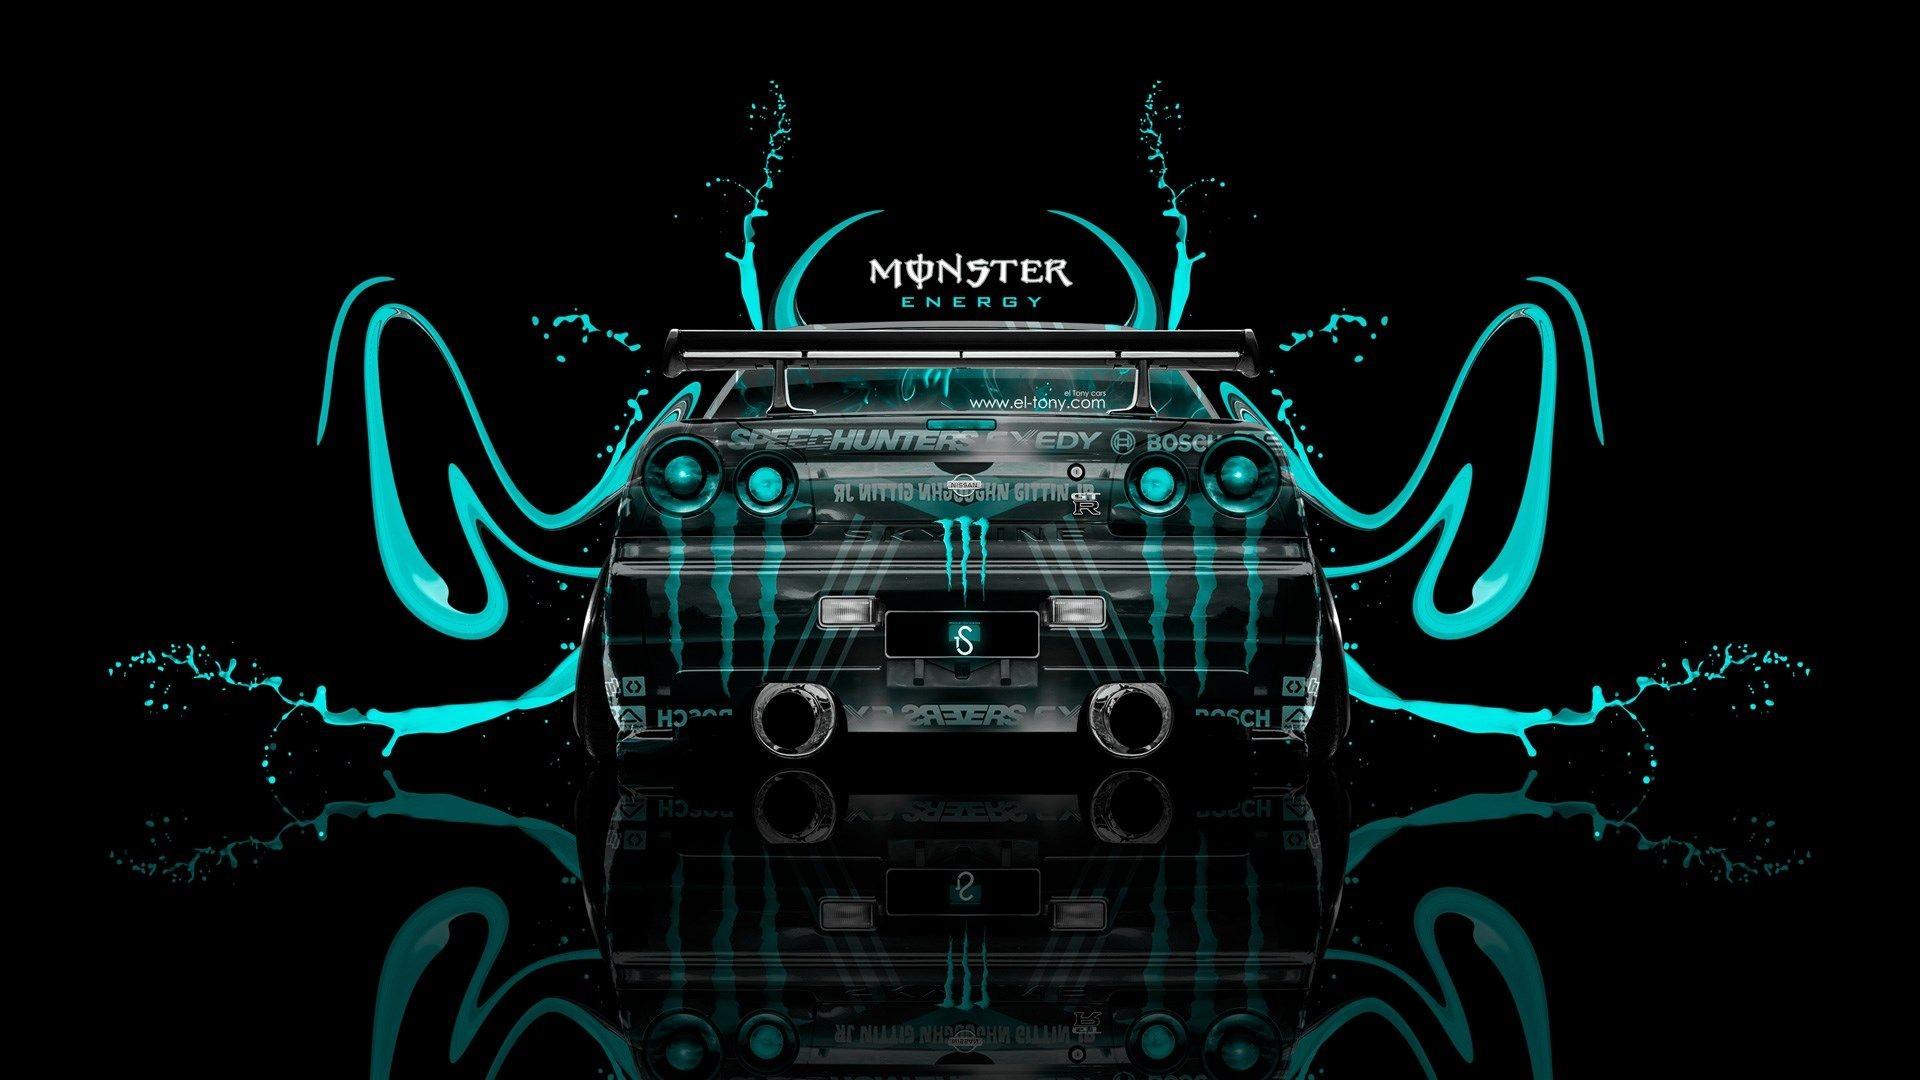 Res: 1920x1080, Monster Energy Wallpaper HD